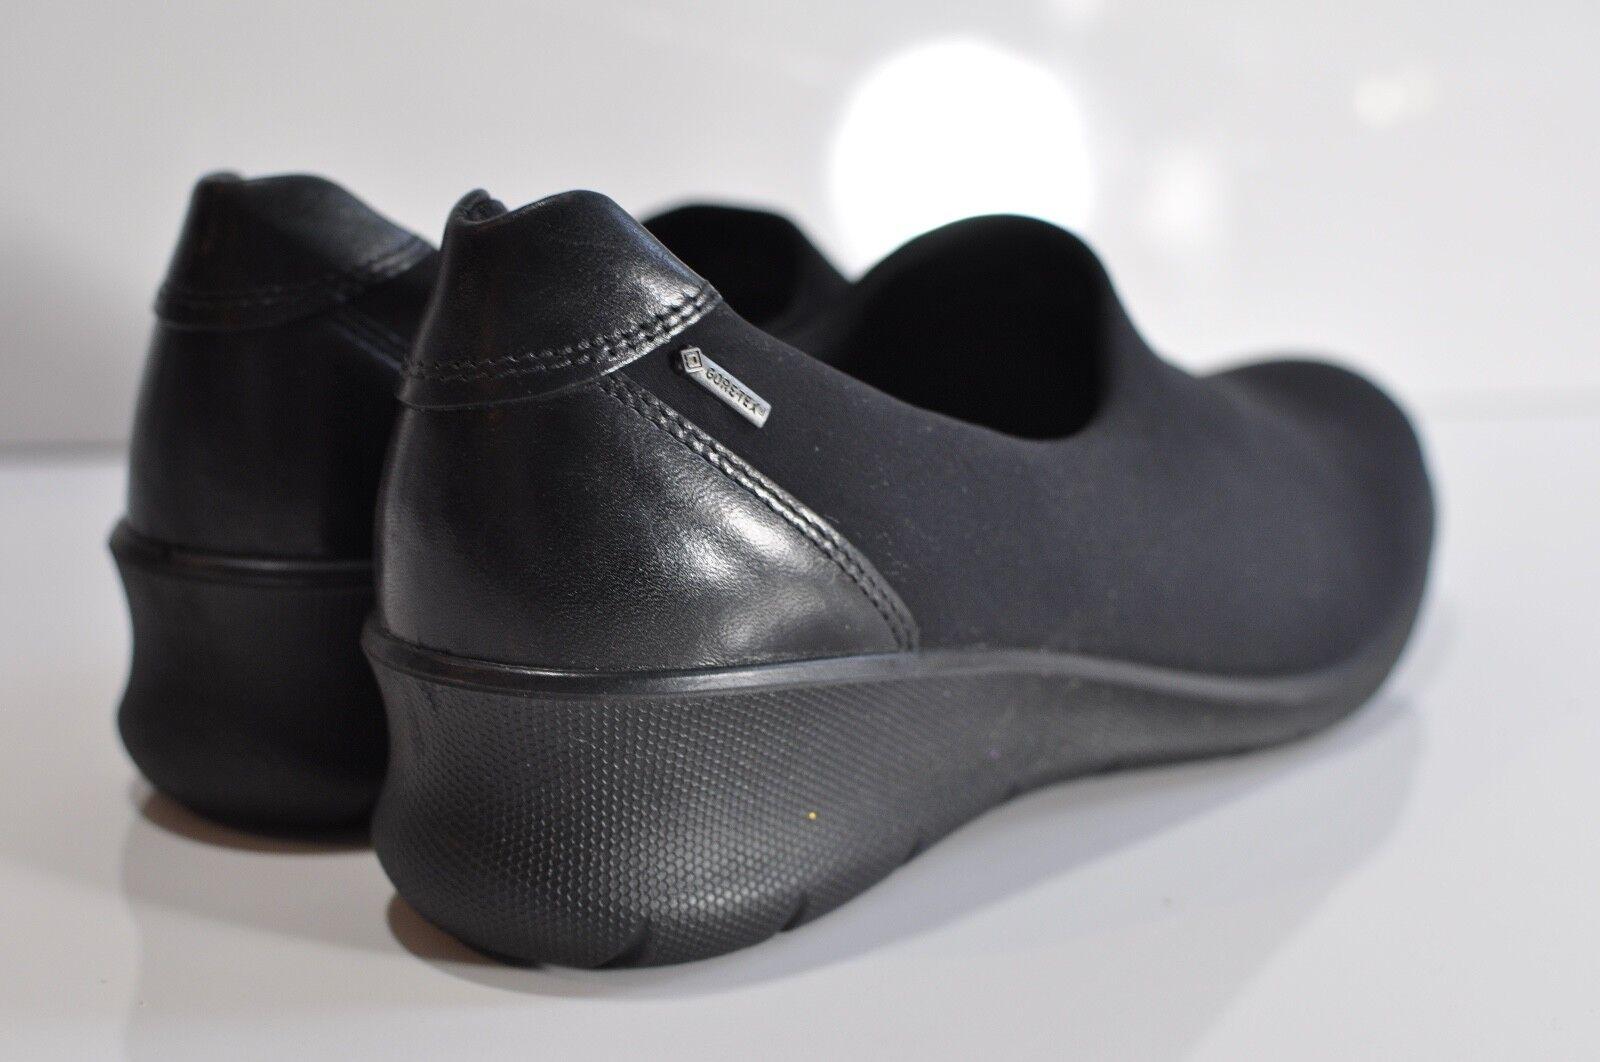 ECCO Gore-Tex Womens slip on shoes black size EU 41